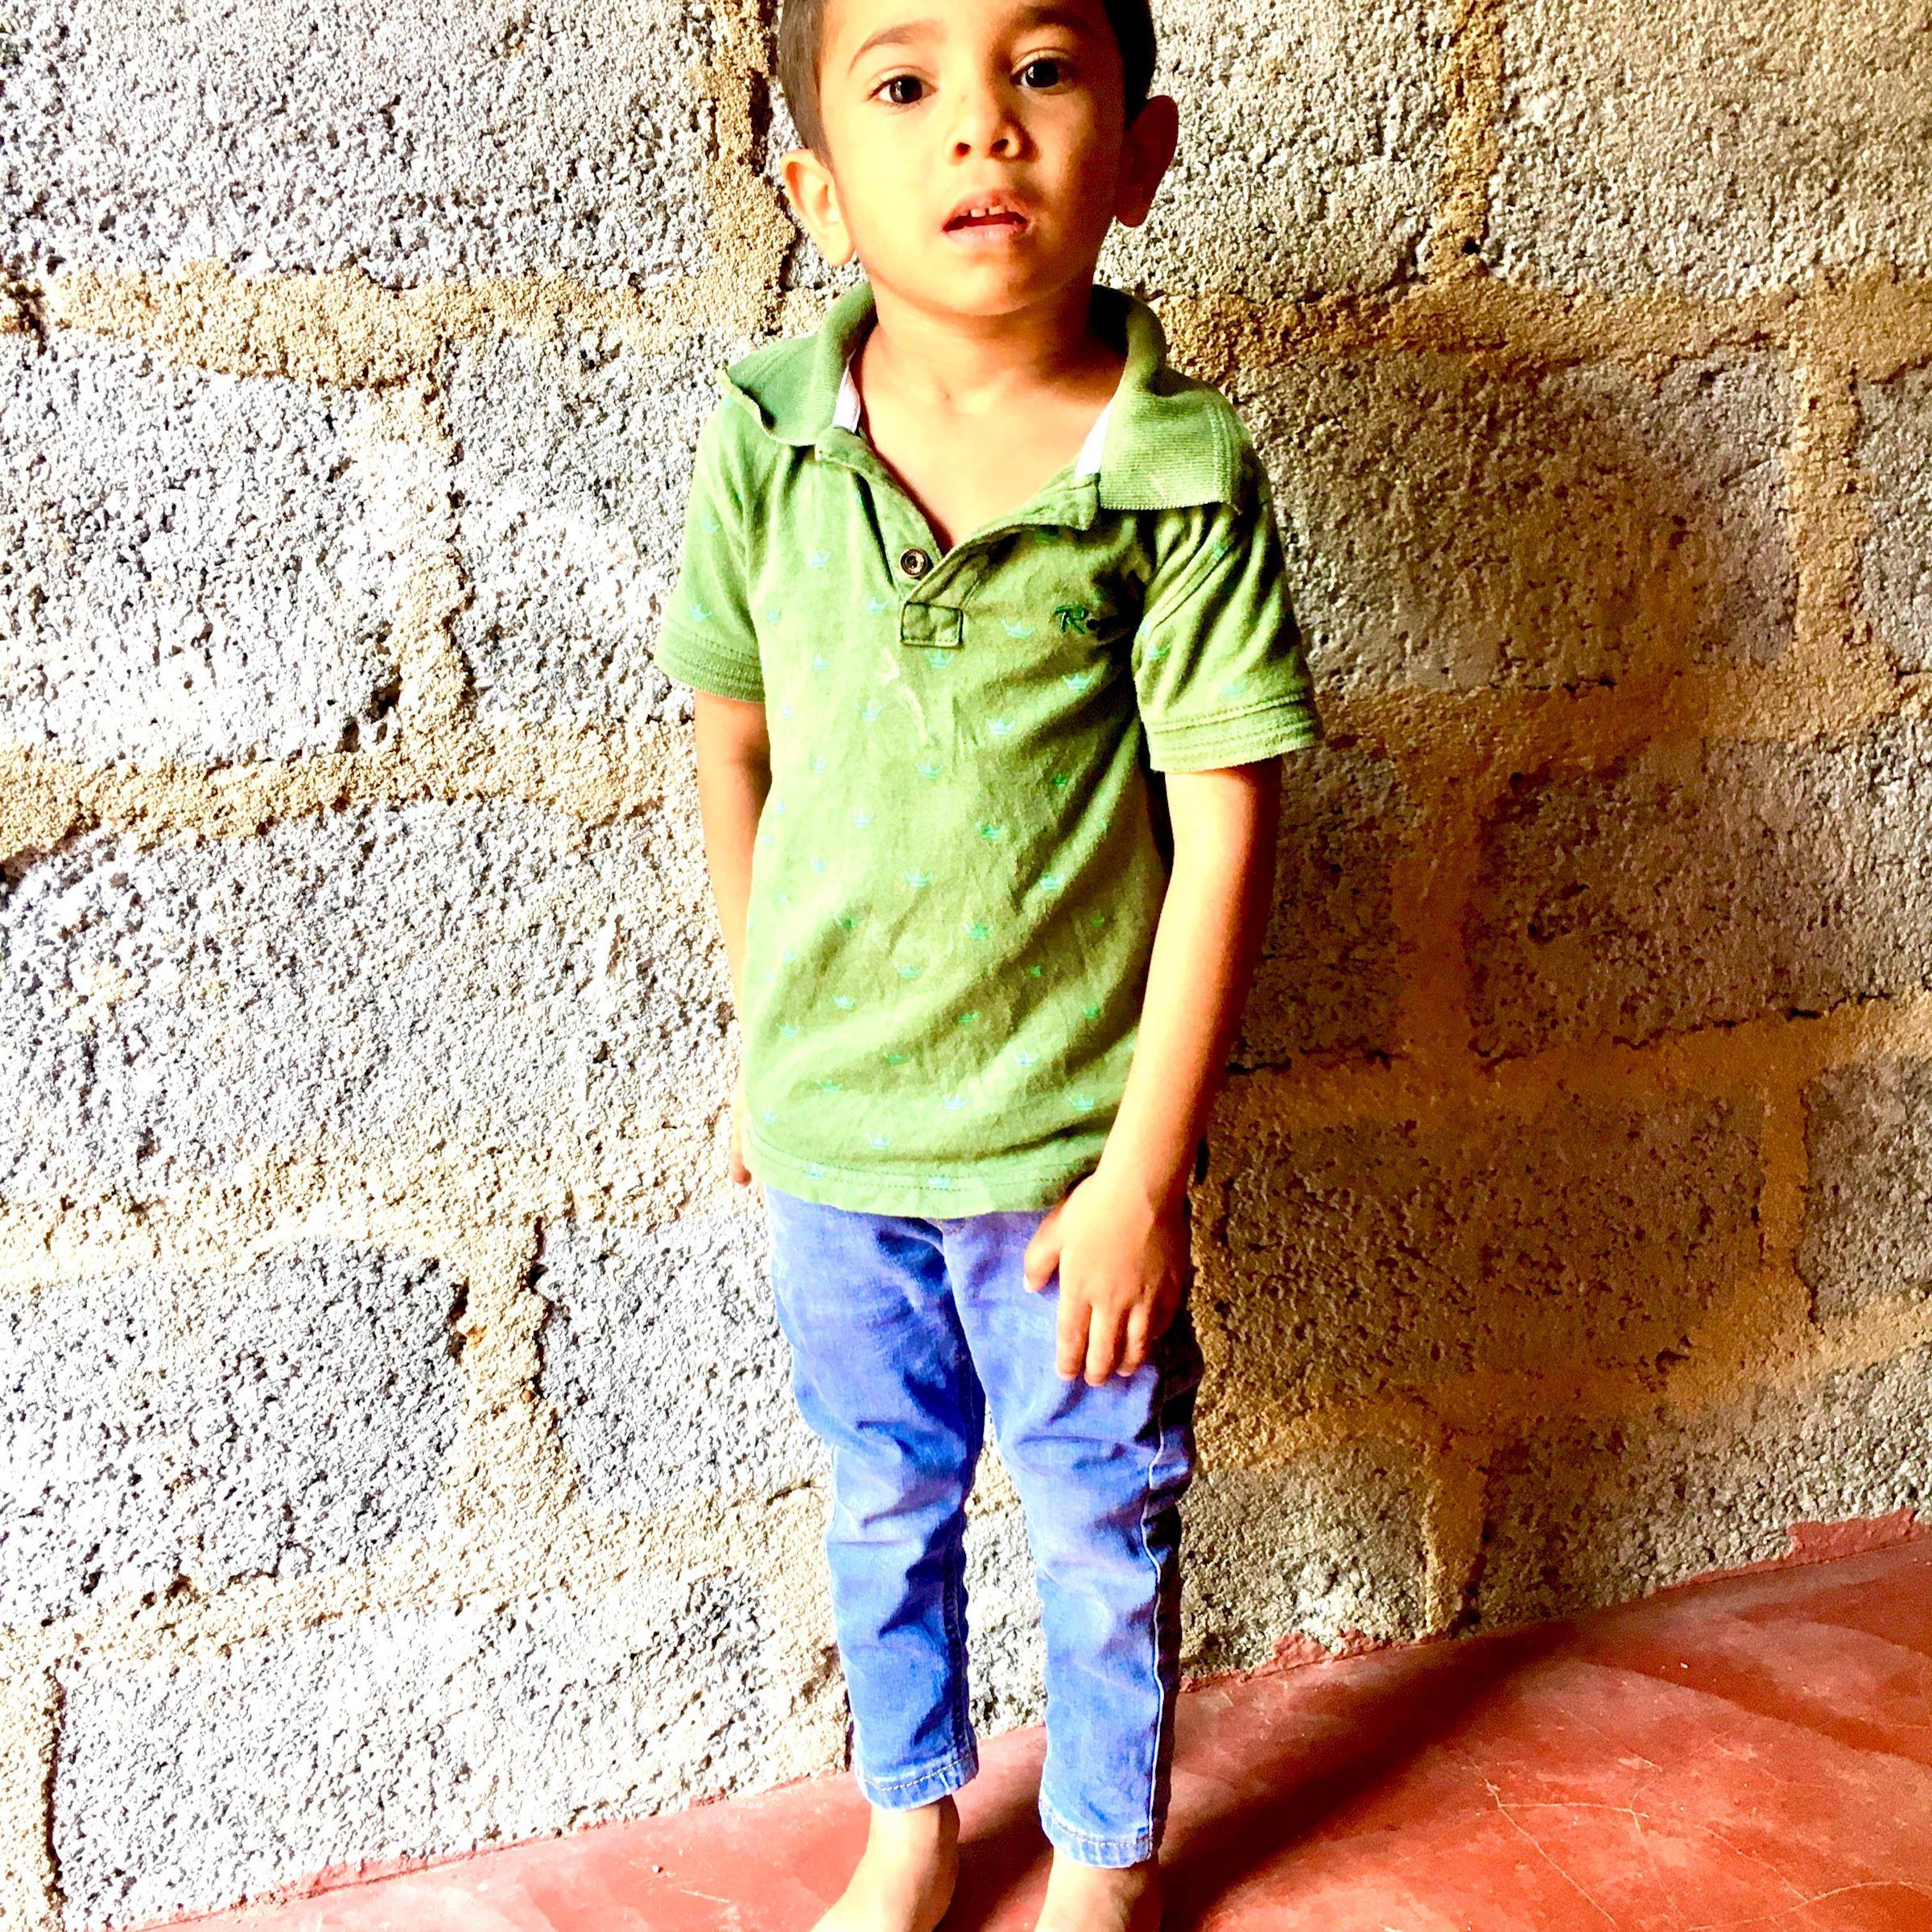 Human Appeal Orphan - Rayyan